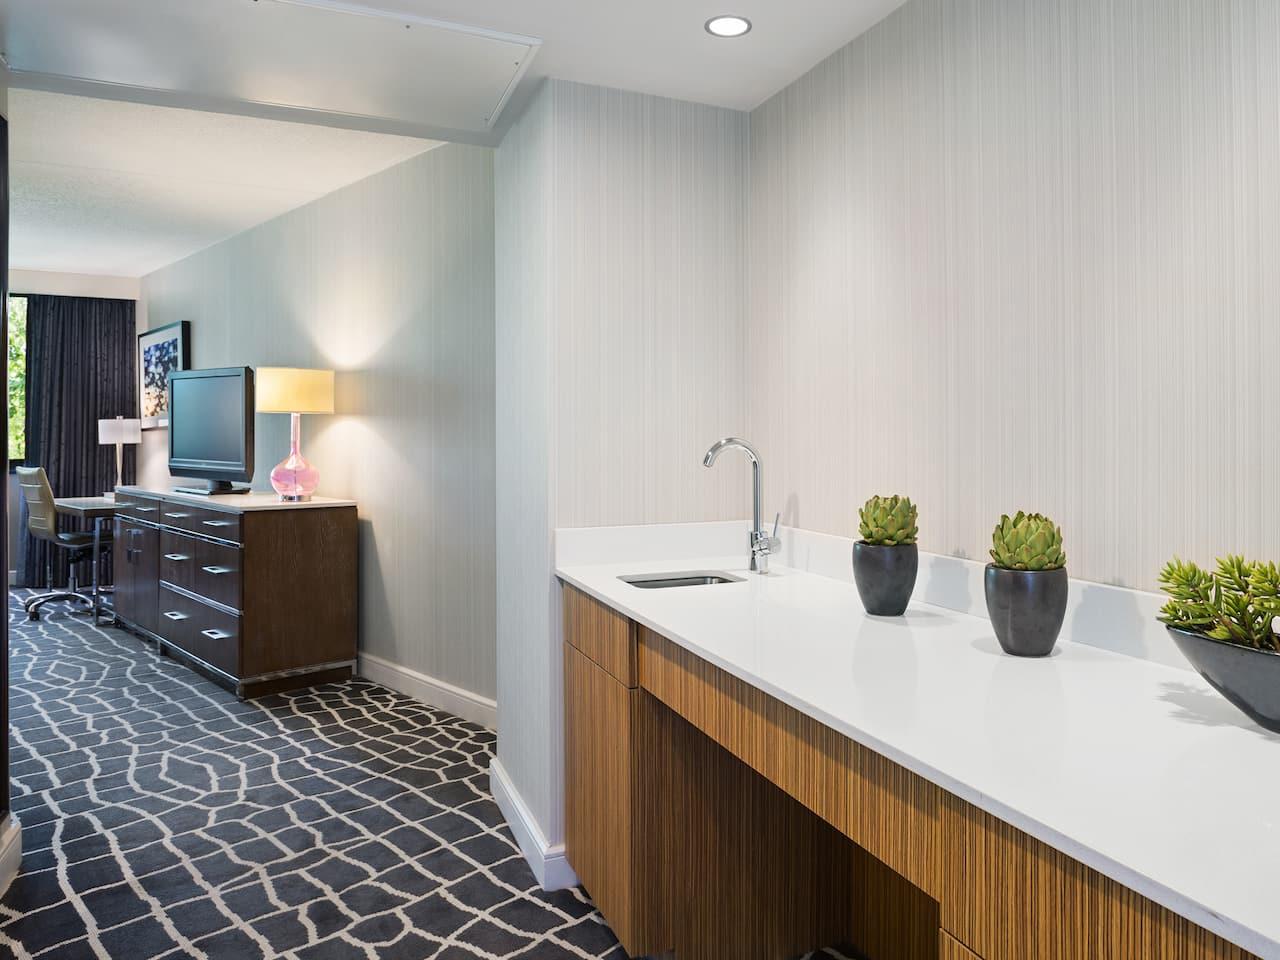 Hyatt Regency Room Hallway Image